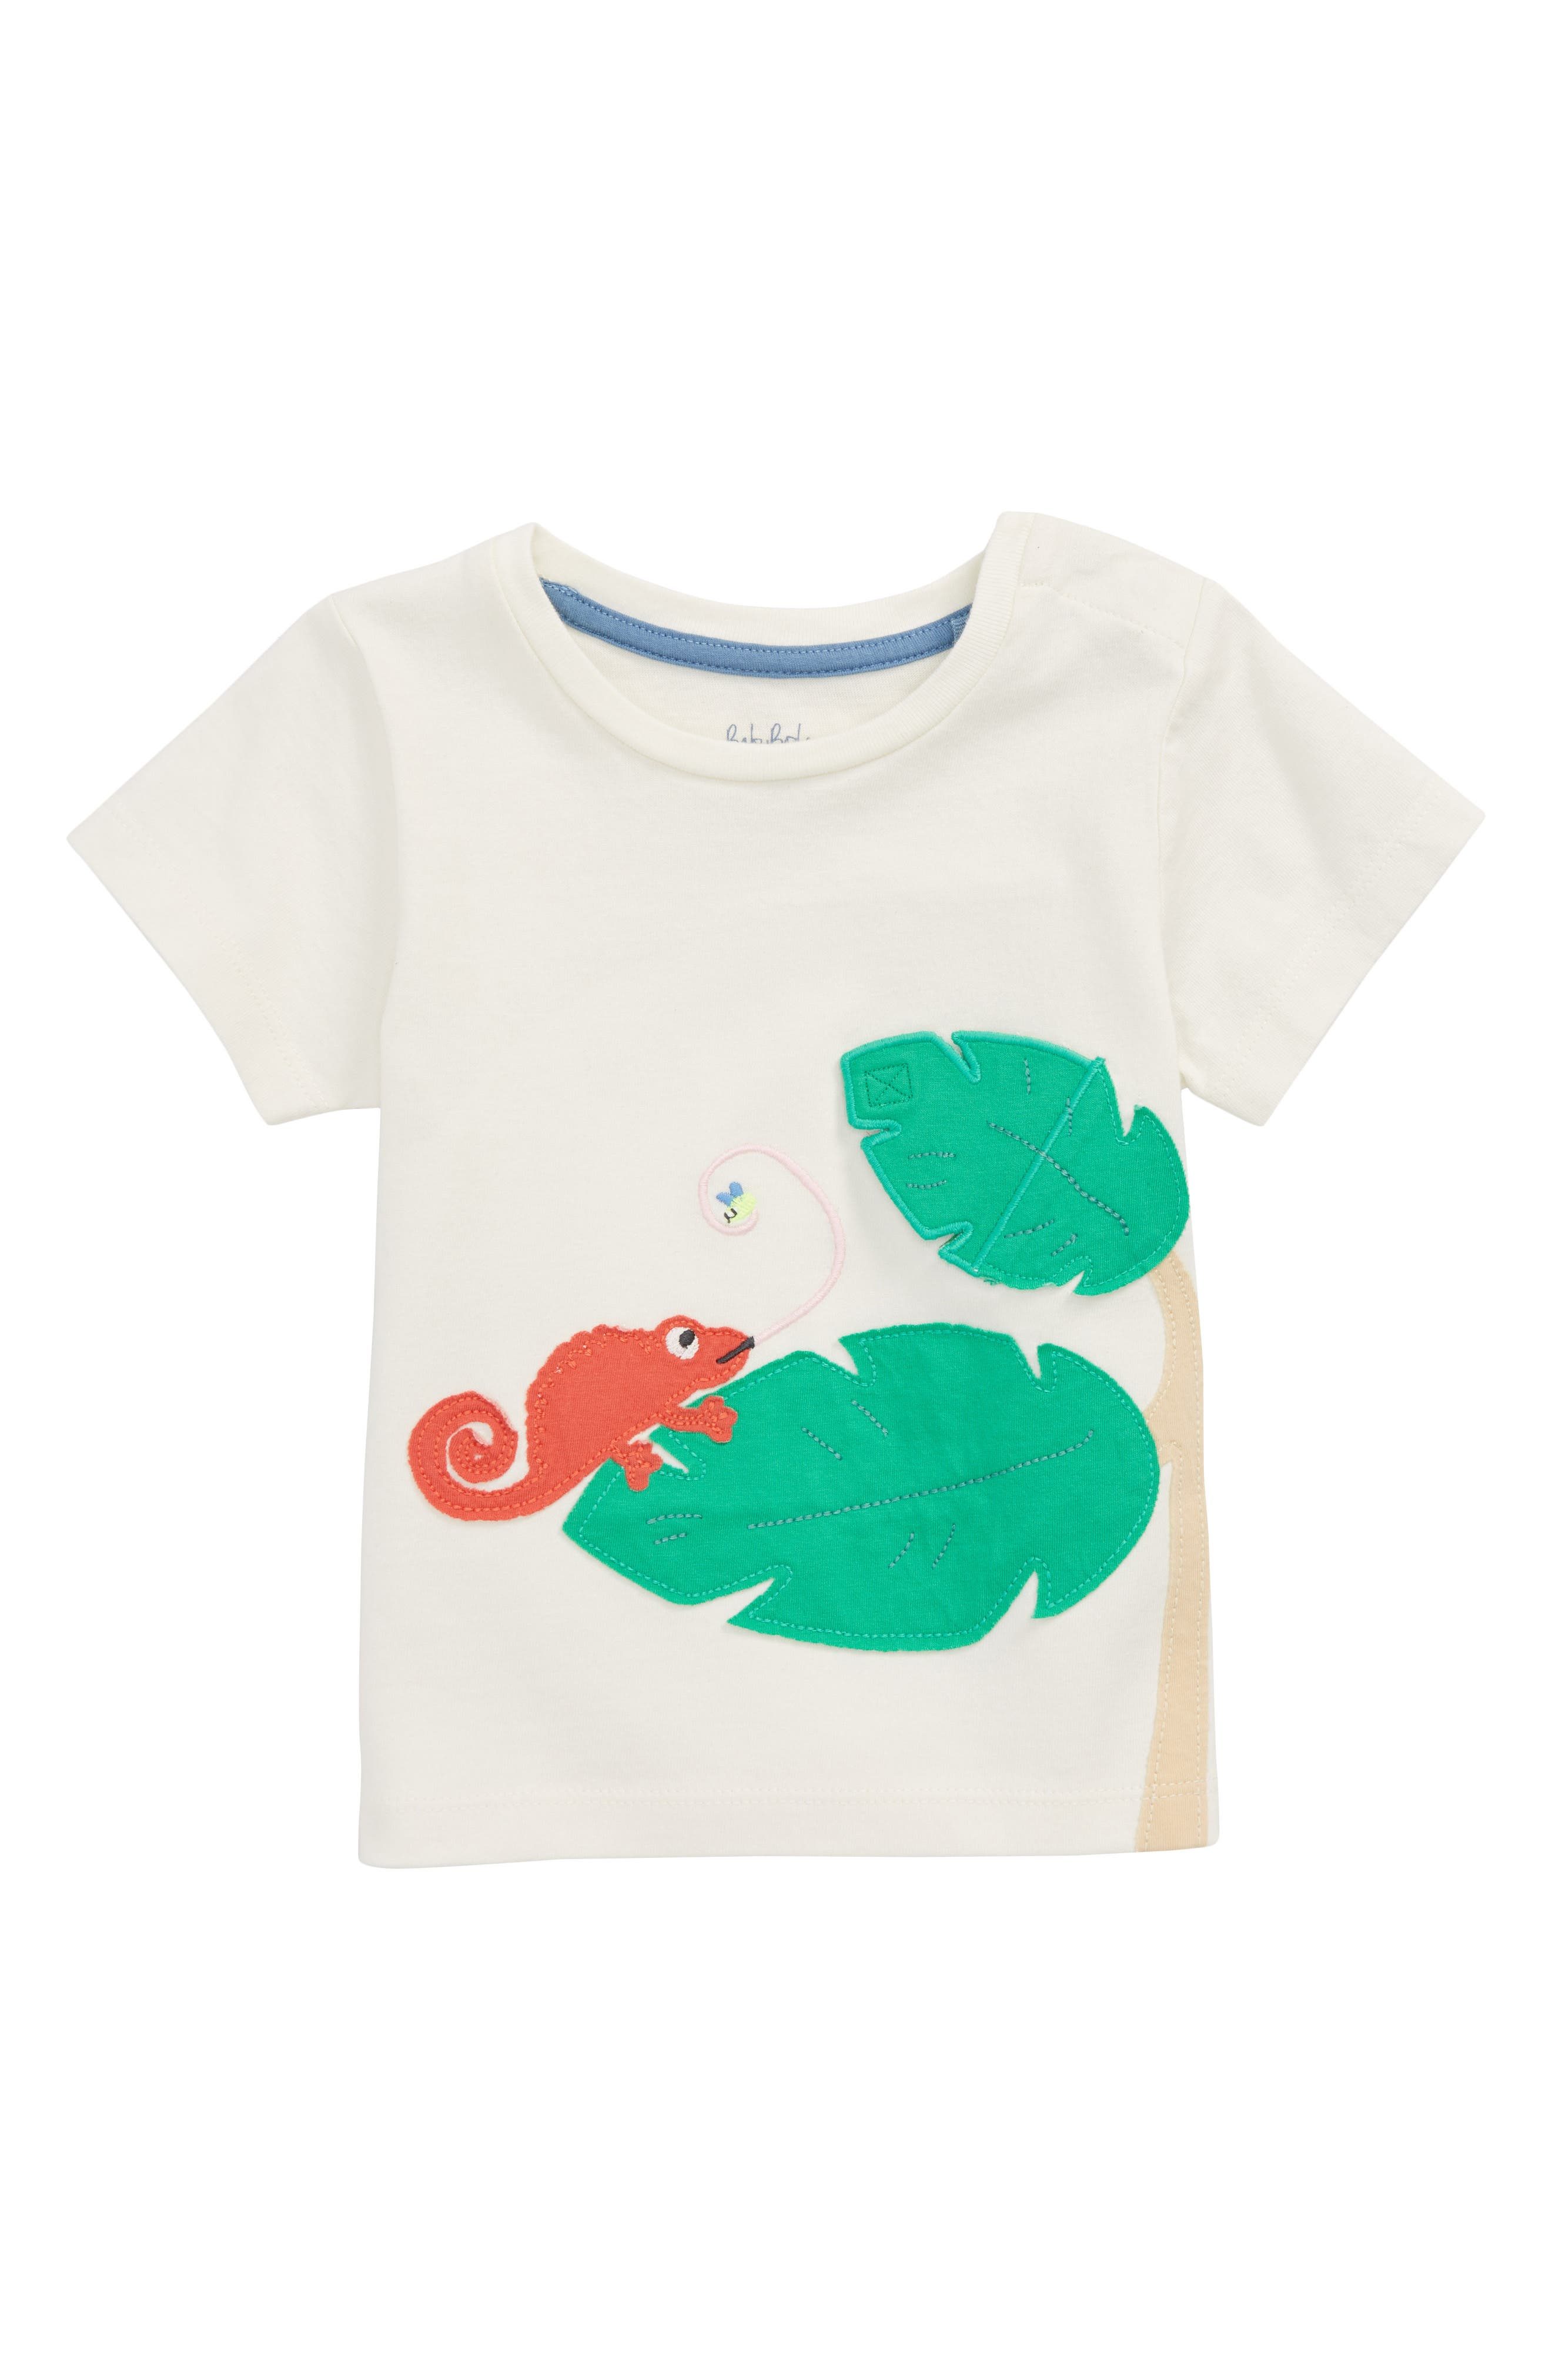 Peekaboo T-Shirt,                         Main,                         color, Ivory Lizards